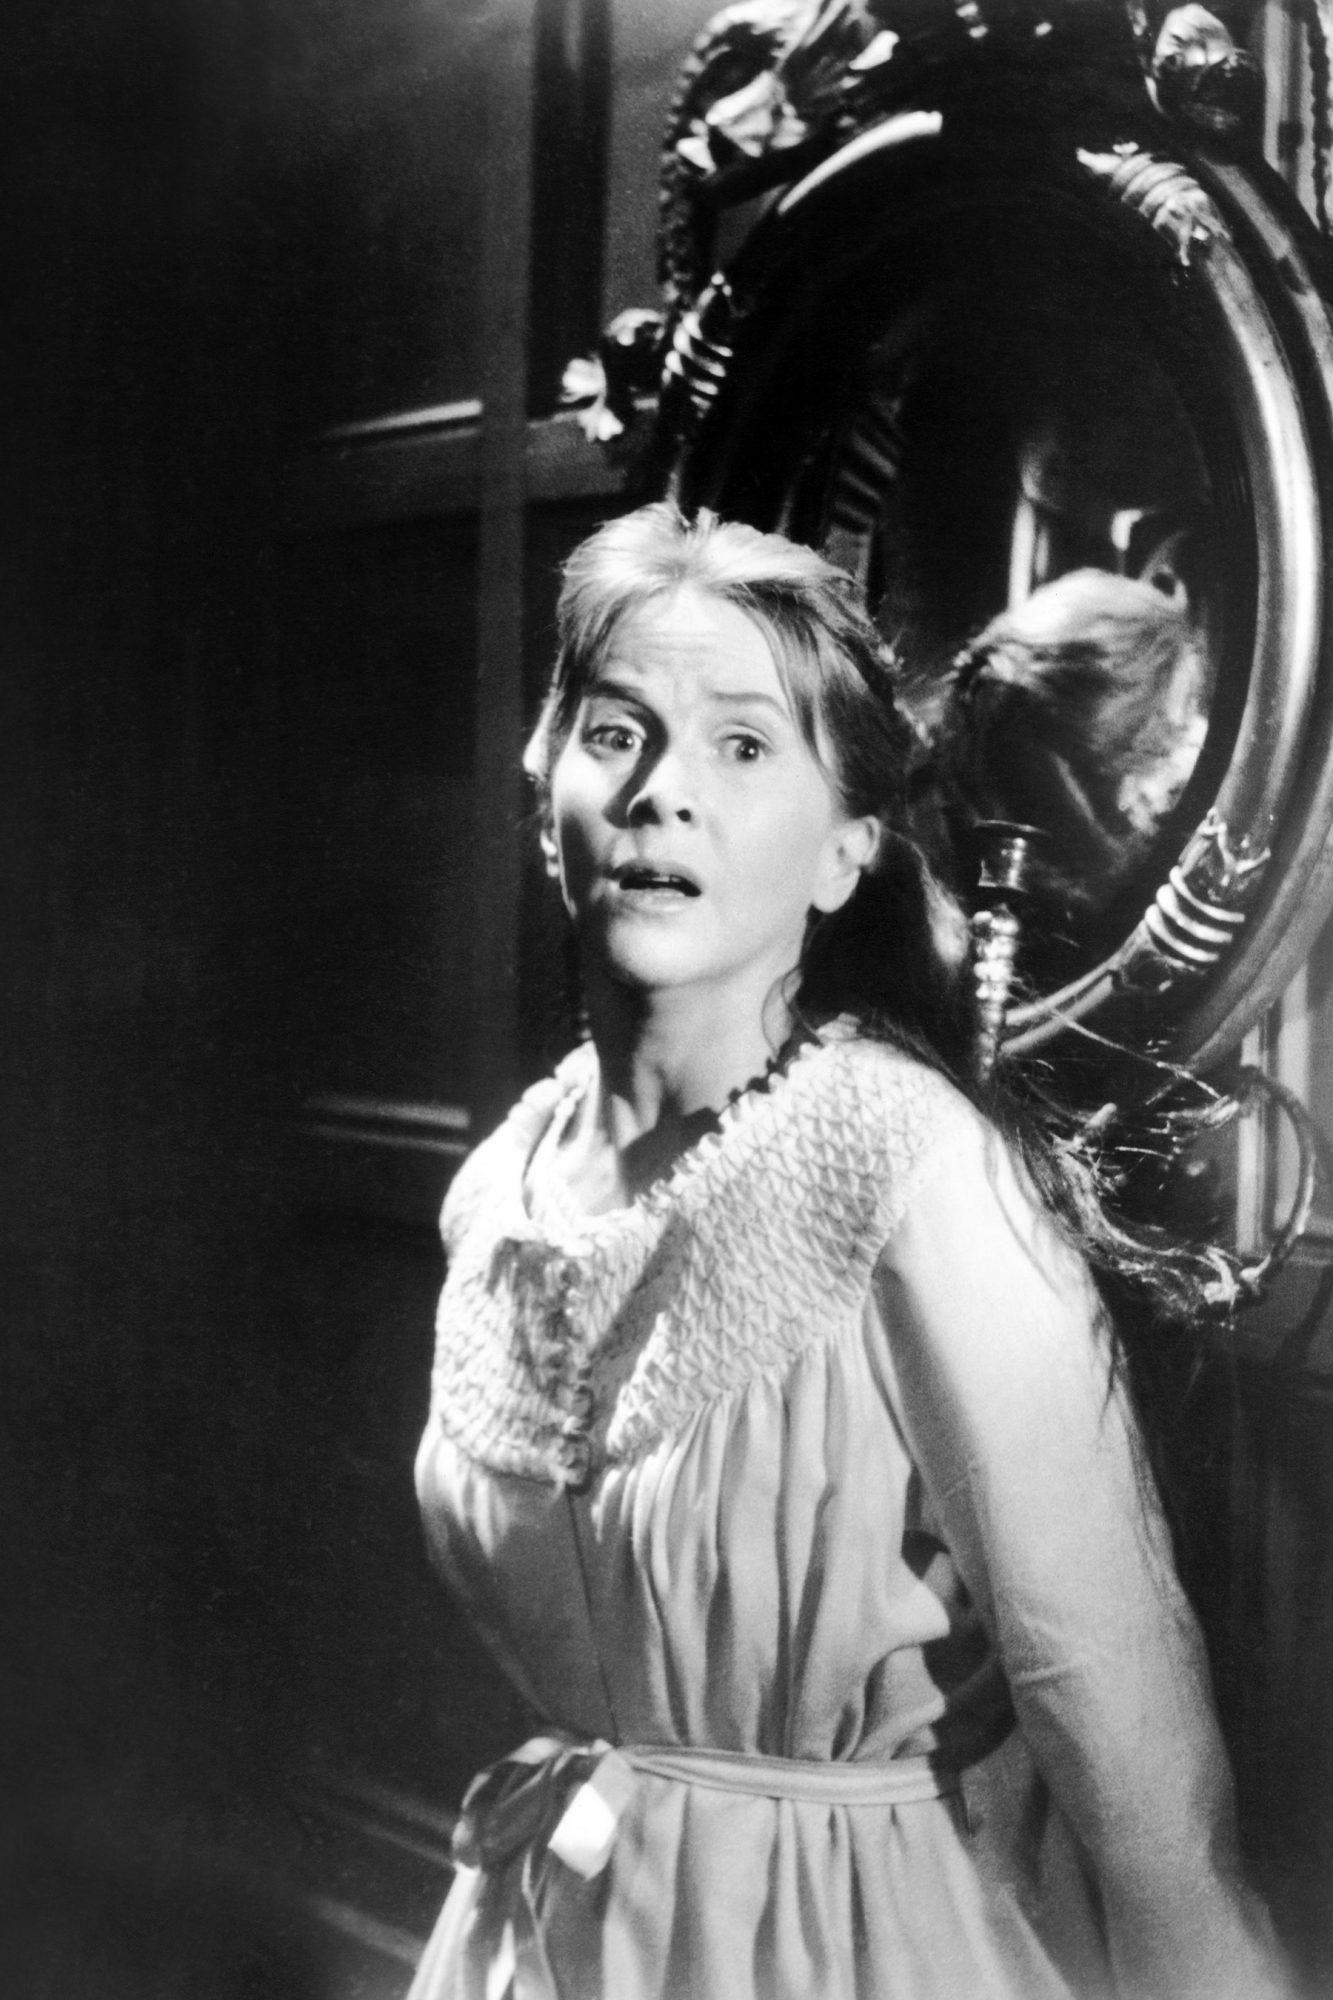 THE HAUNTING, Julie Harris, 1963